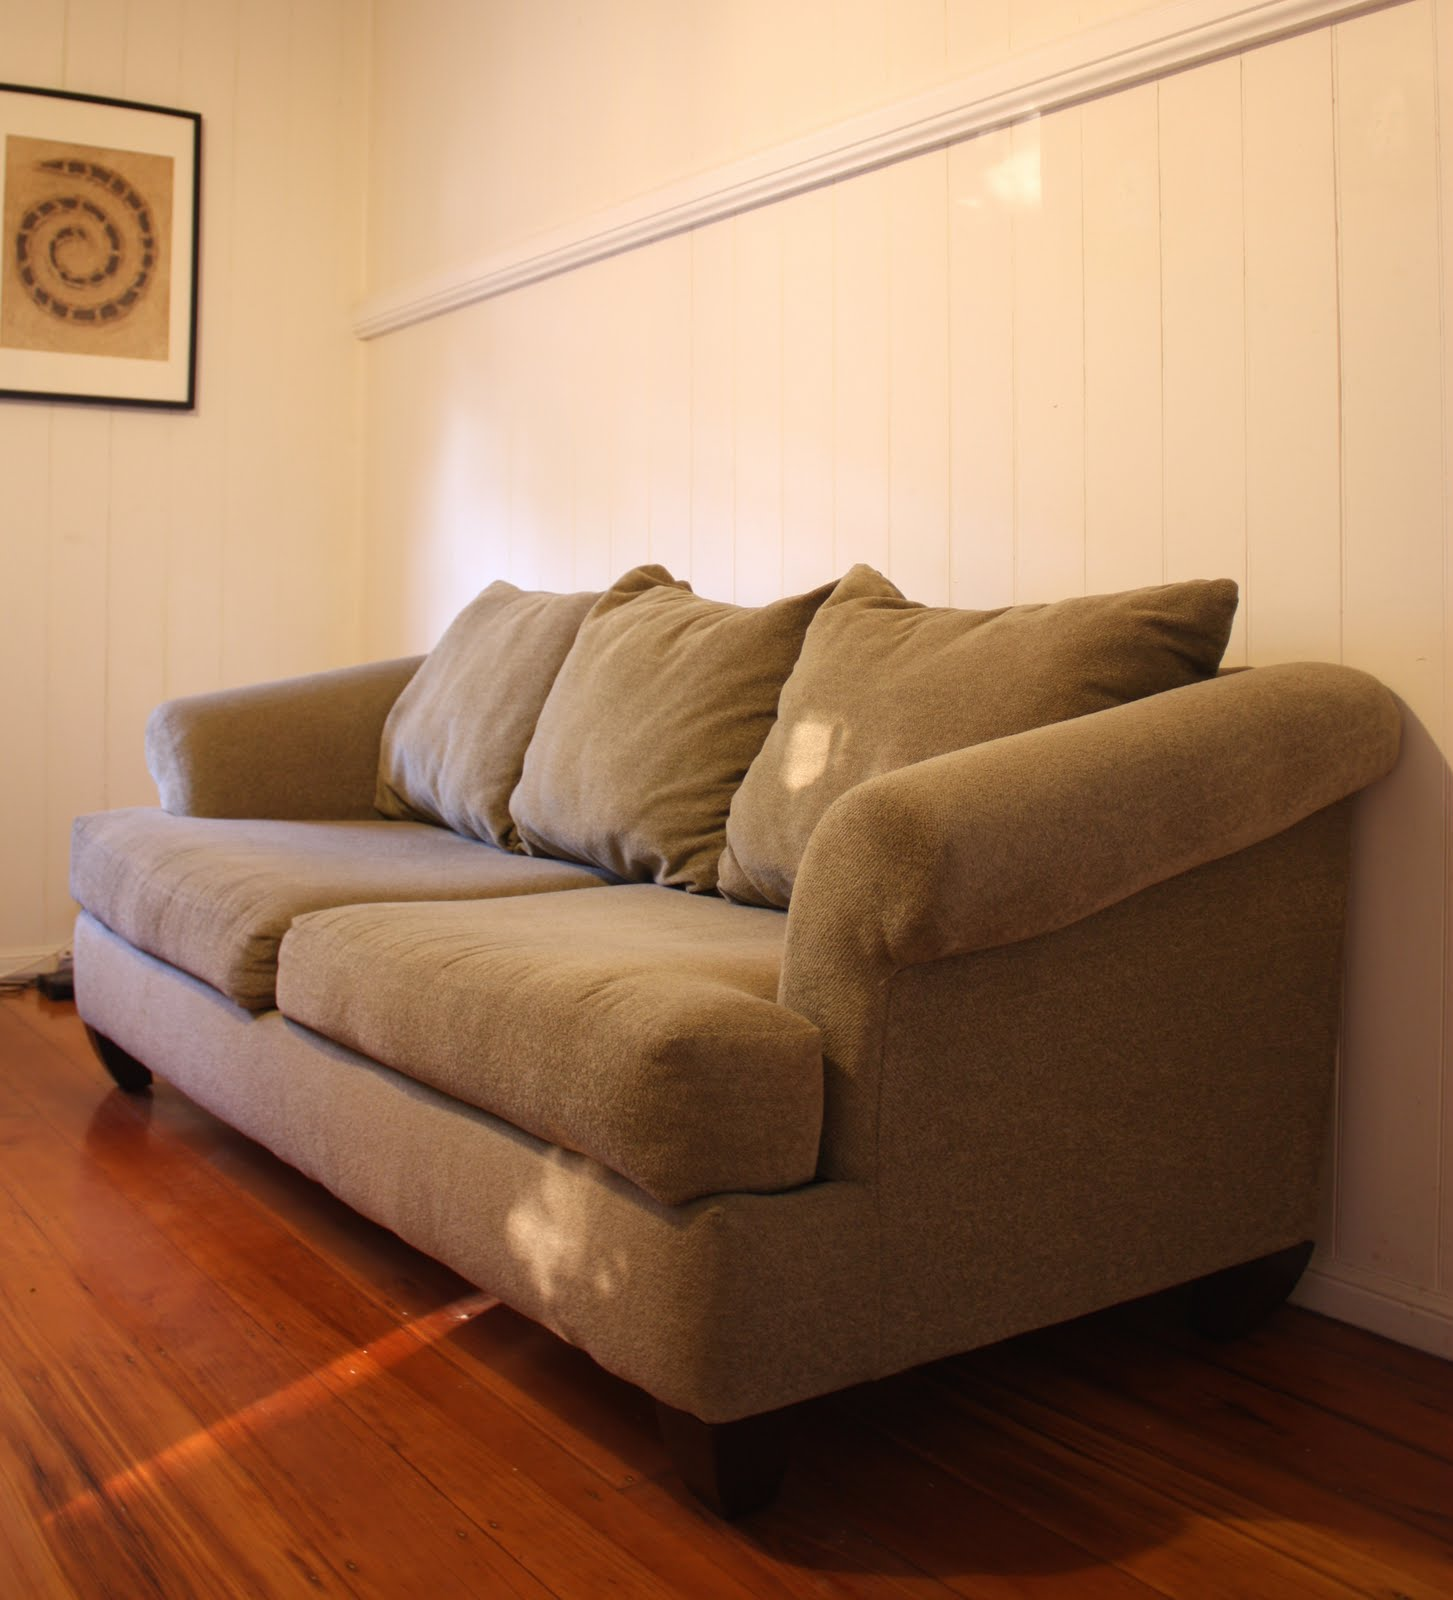 Damaged Furniture Sale: The Vona's Big Sale